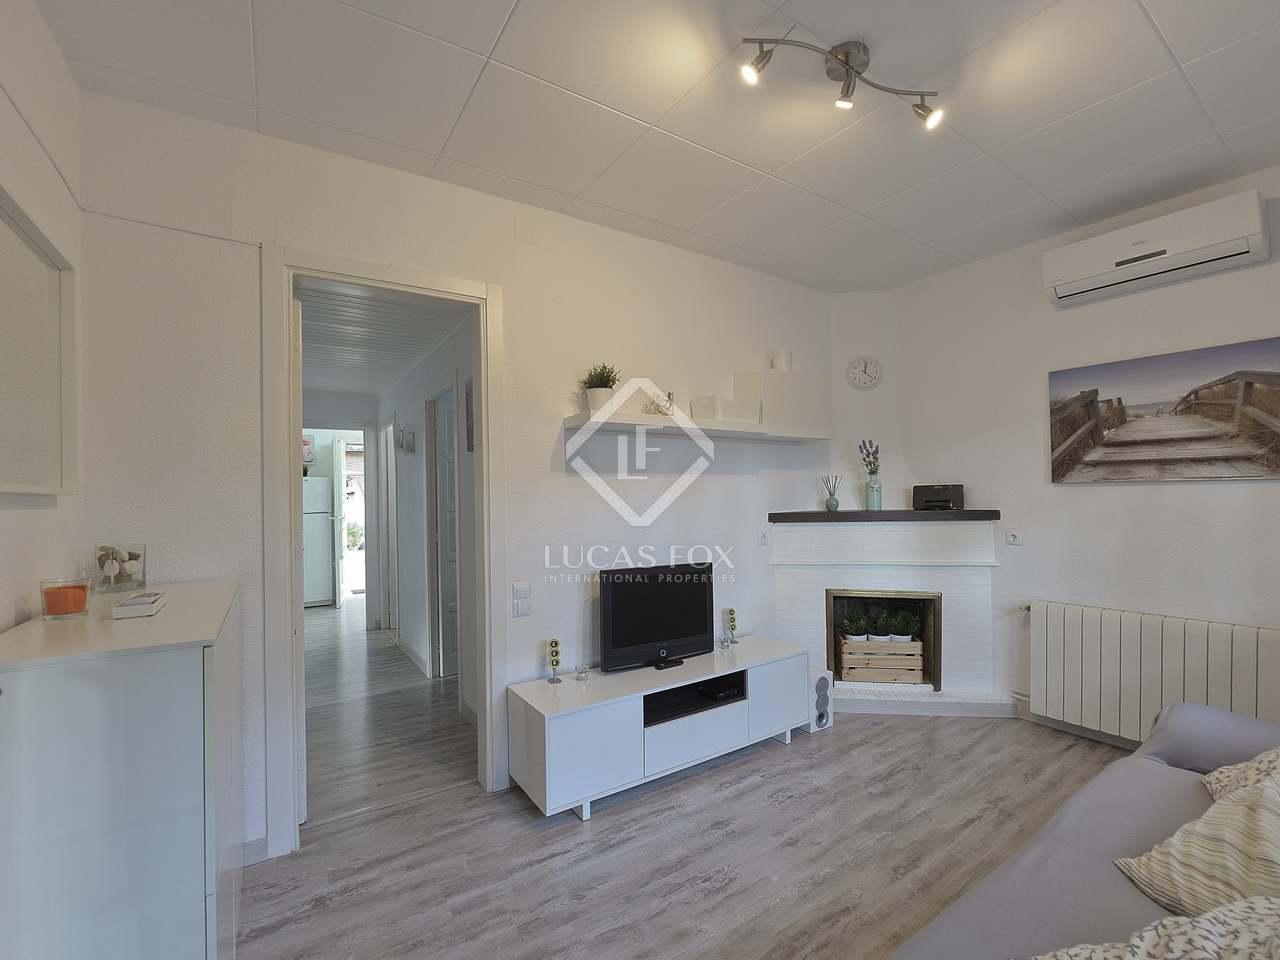 Casa de 75 m en alquiler en castelldefels barcelona for Alquiler casa jardin barcelona